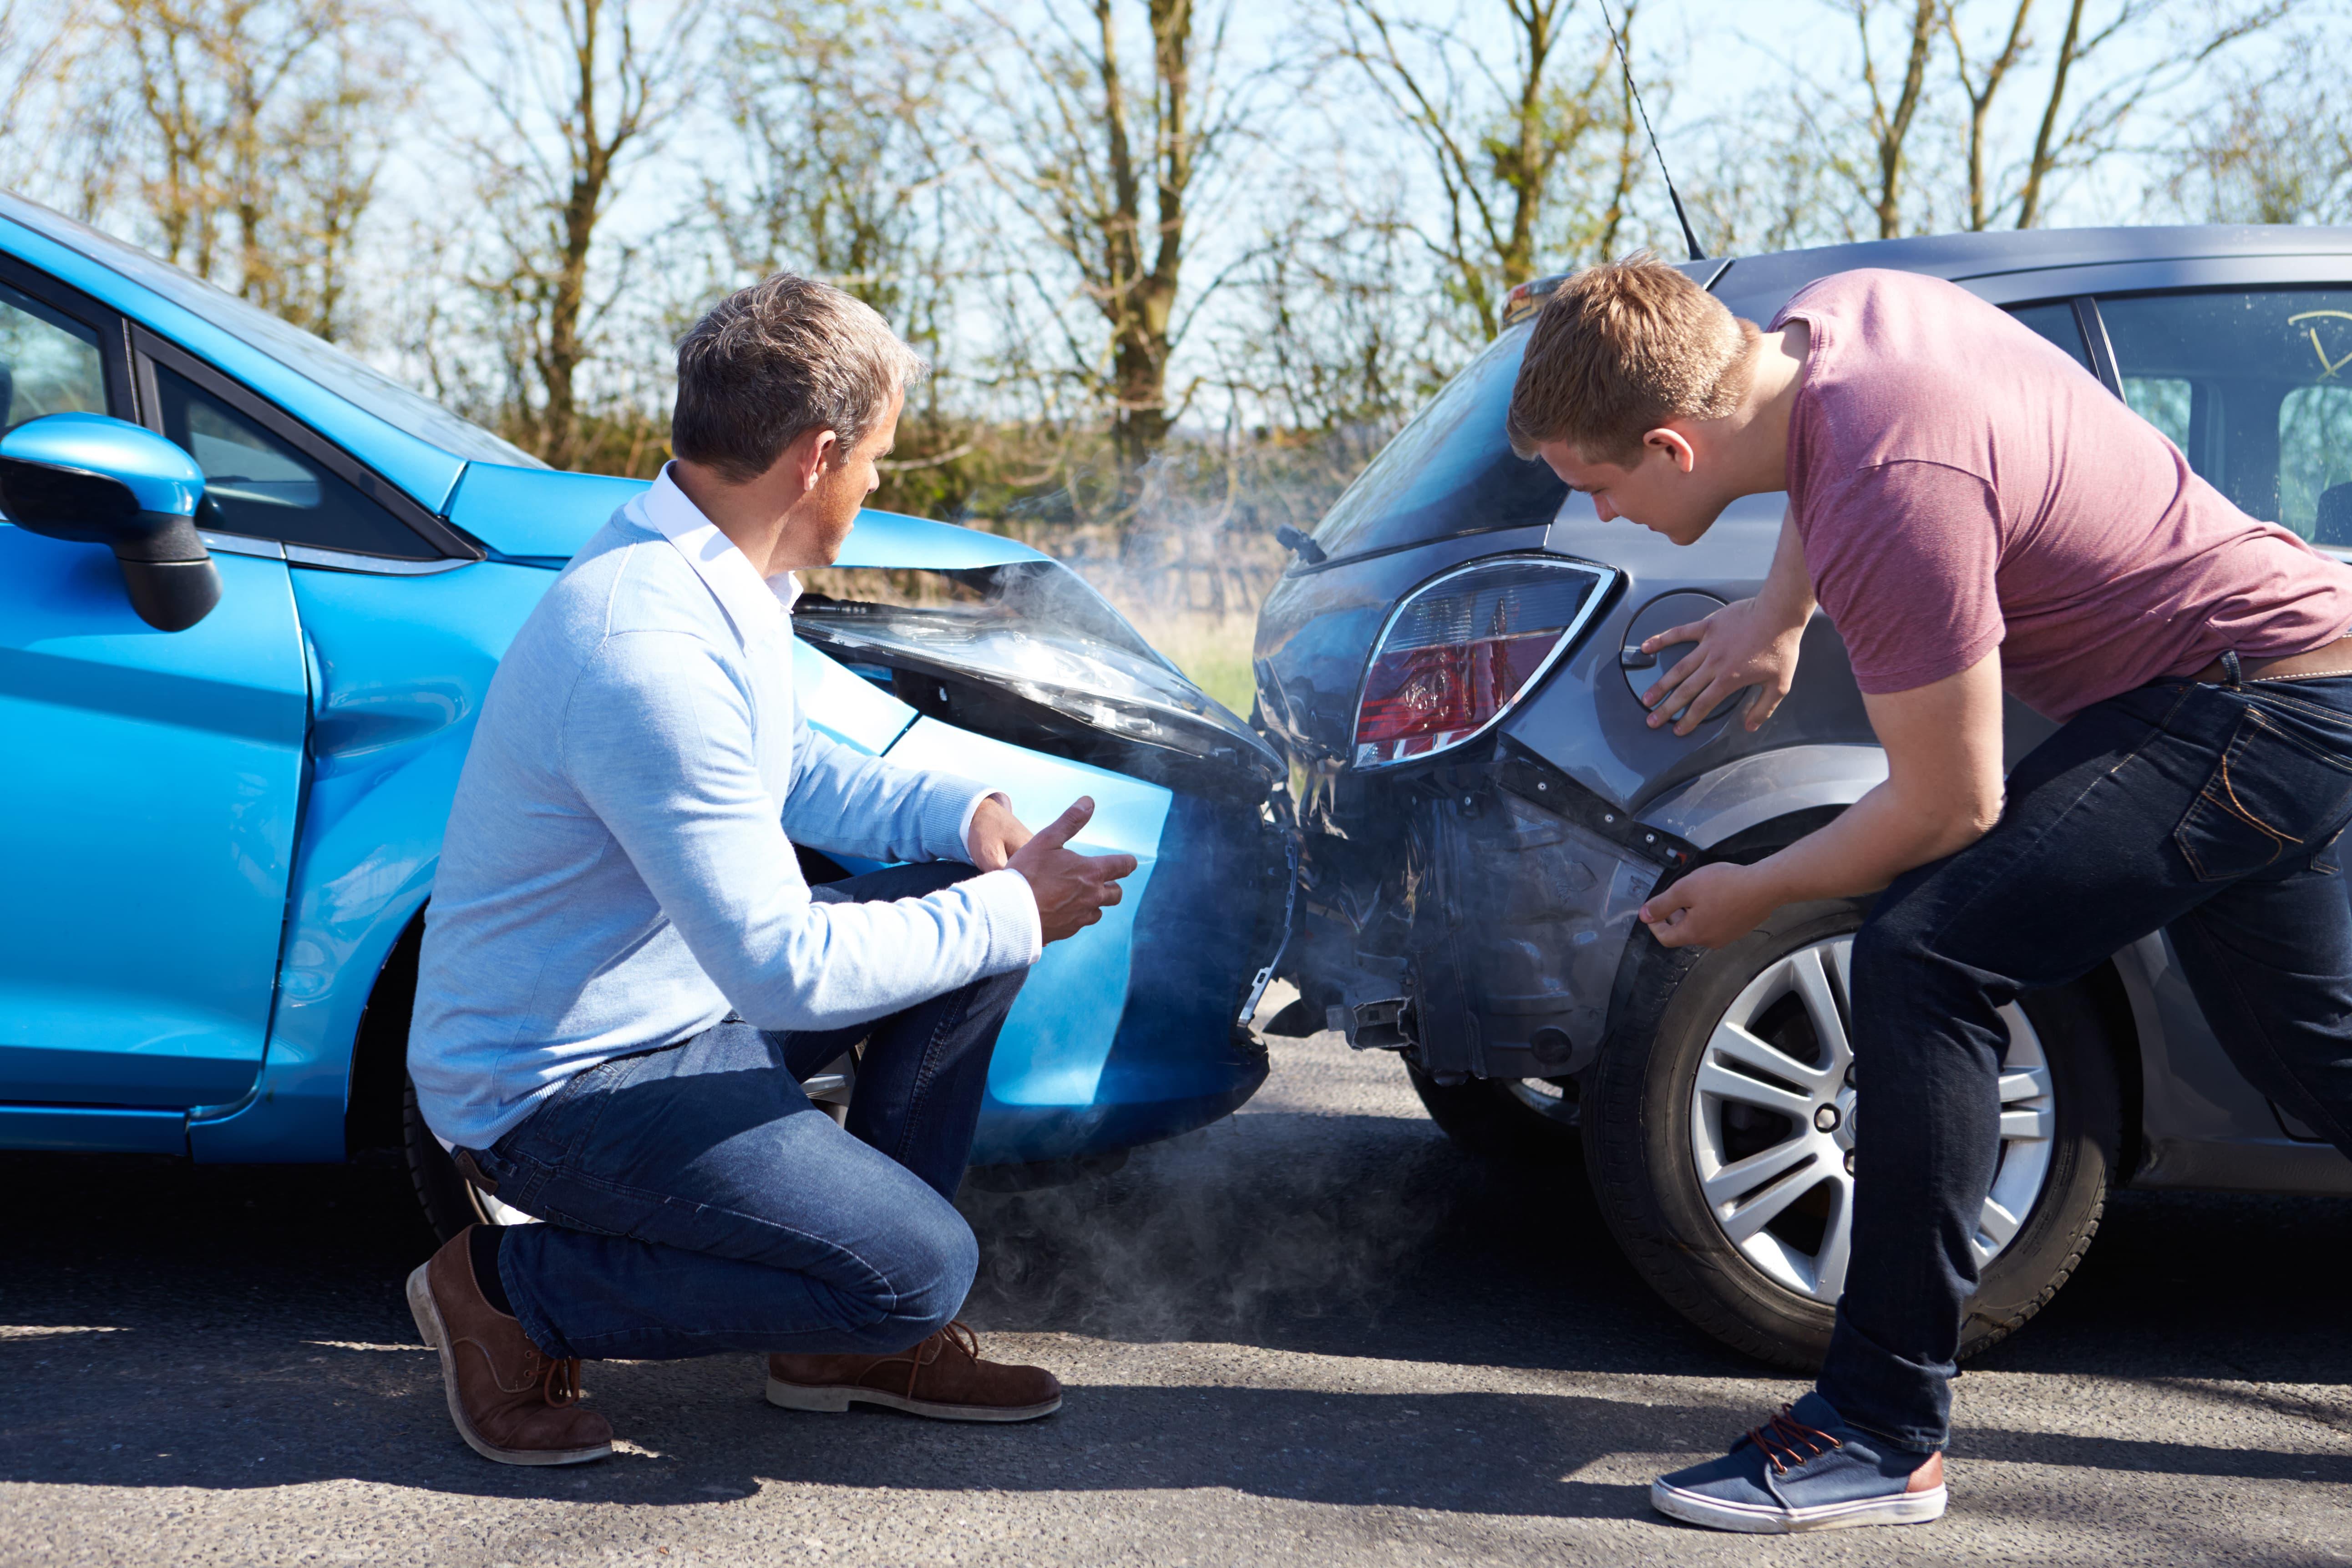 Collision, crash, cars, damage, car accident